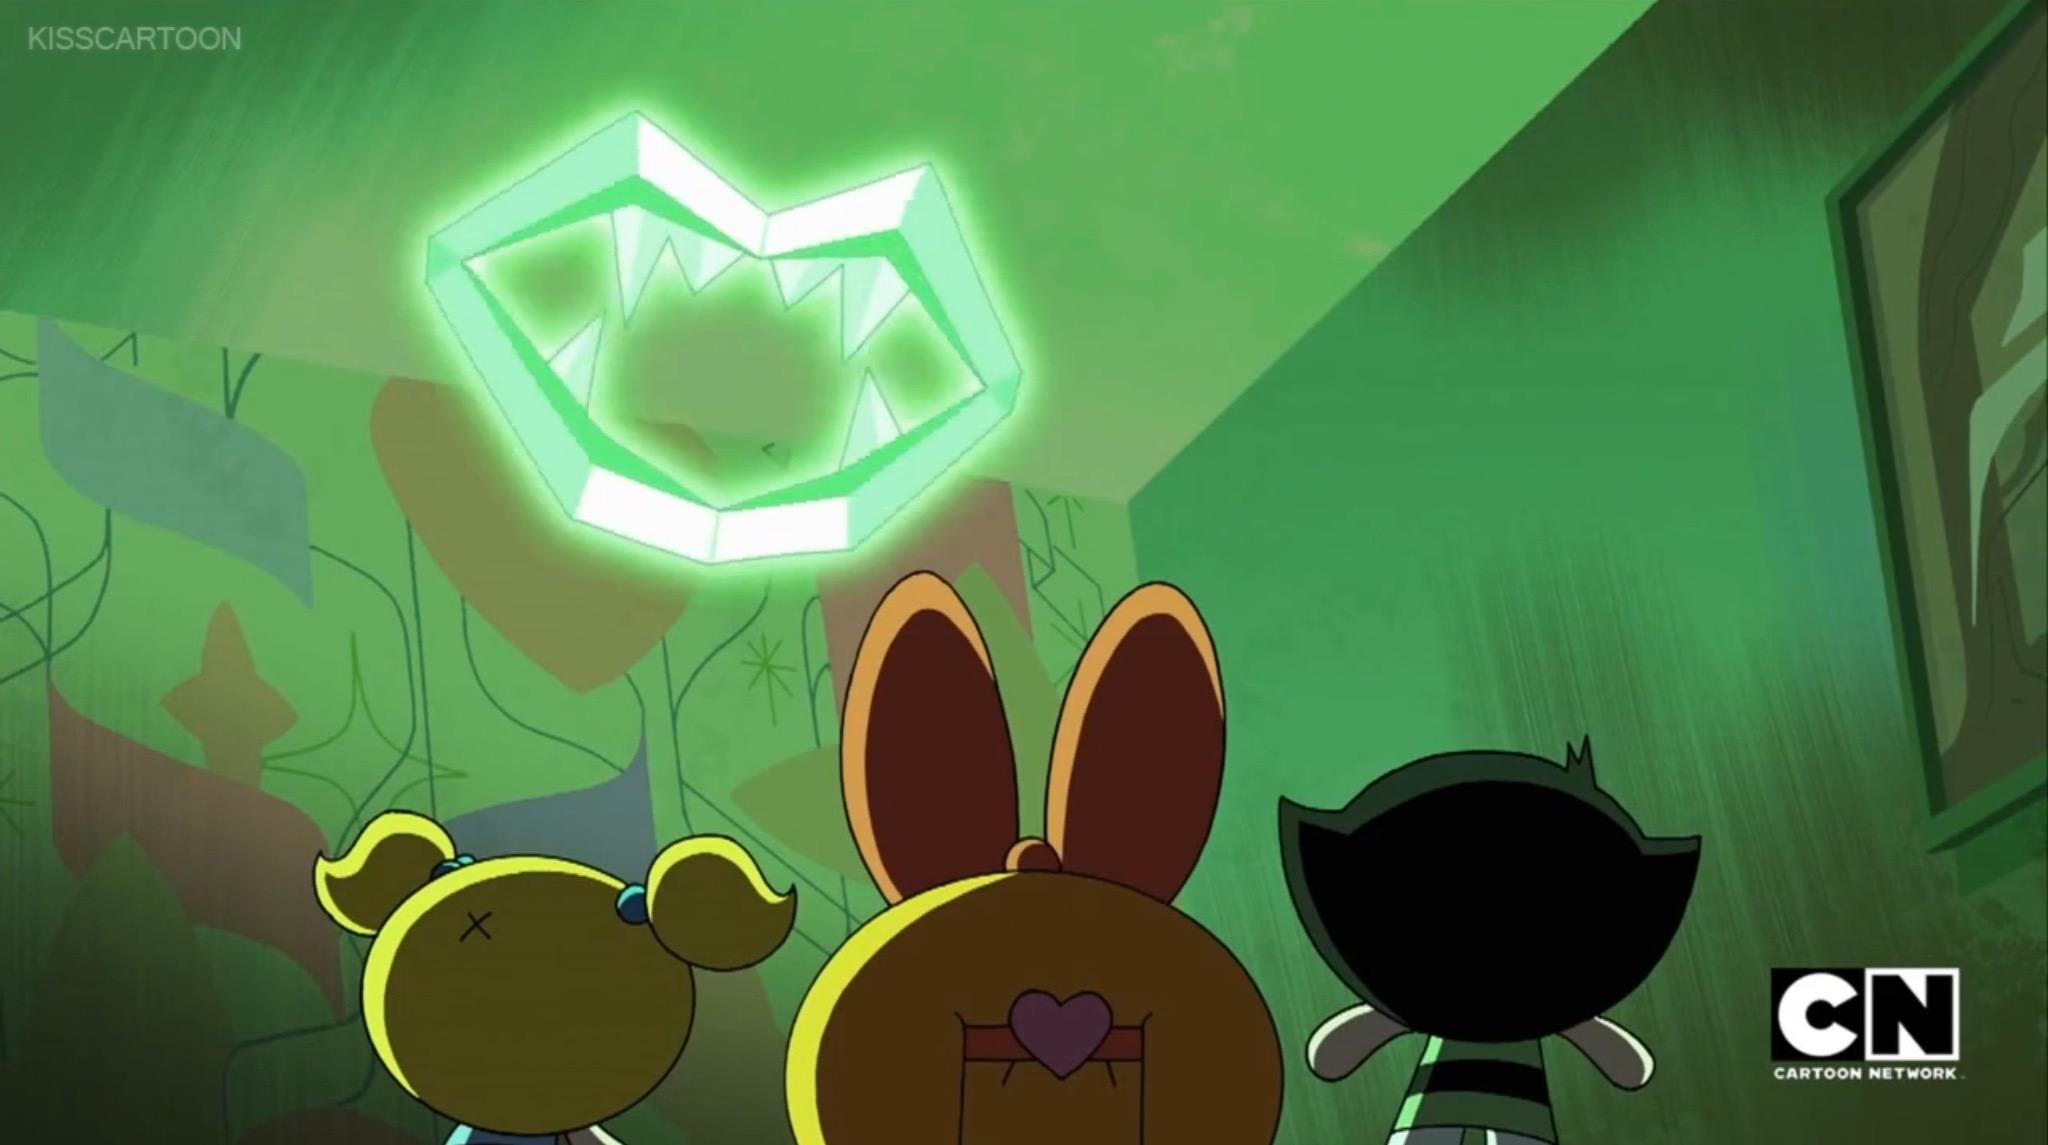 1001 Animations: Secret Swapper of Doom